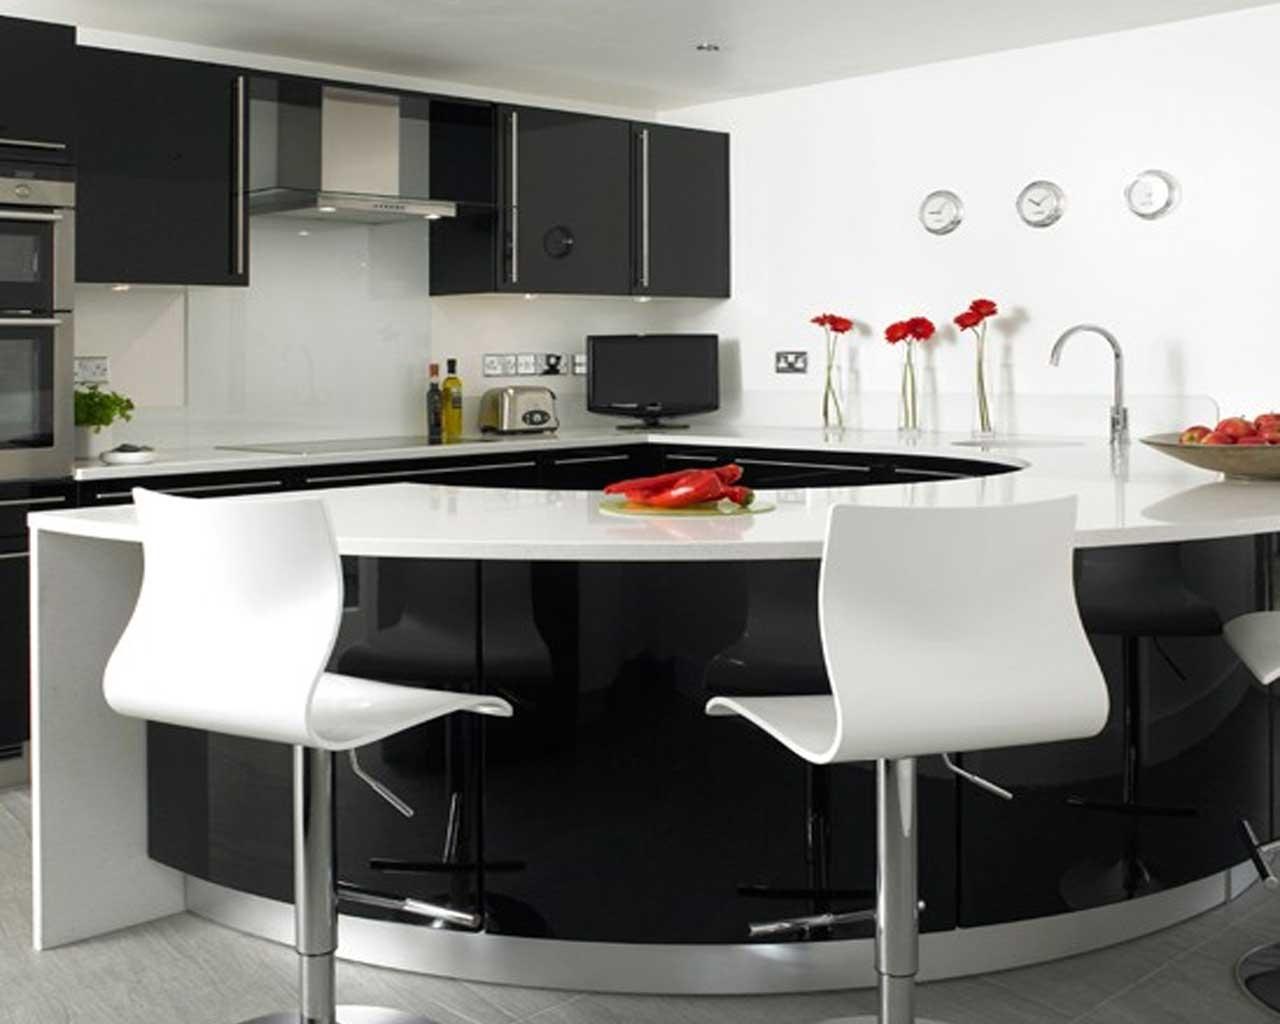 Desain Dapur Minimalis Type 36 Terbaru